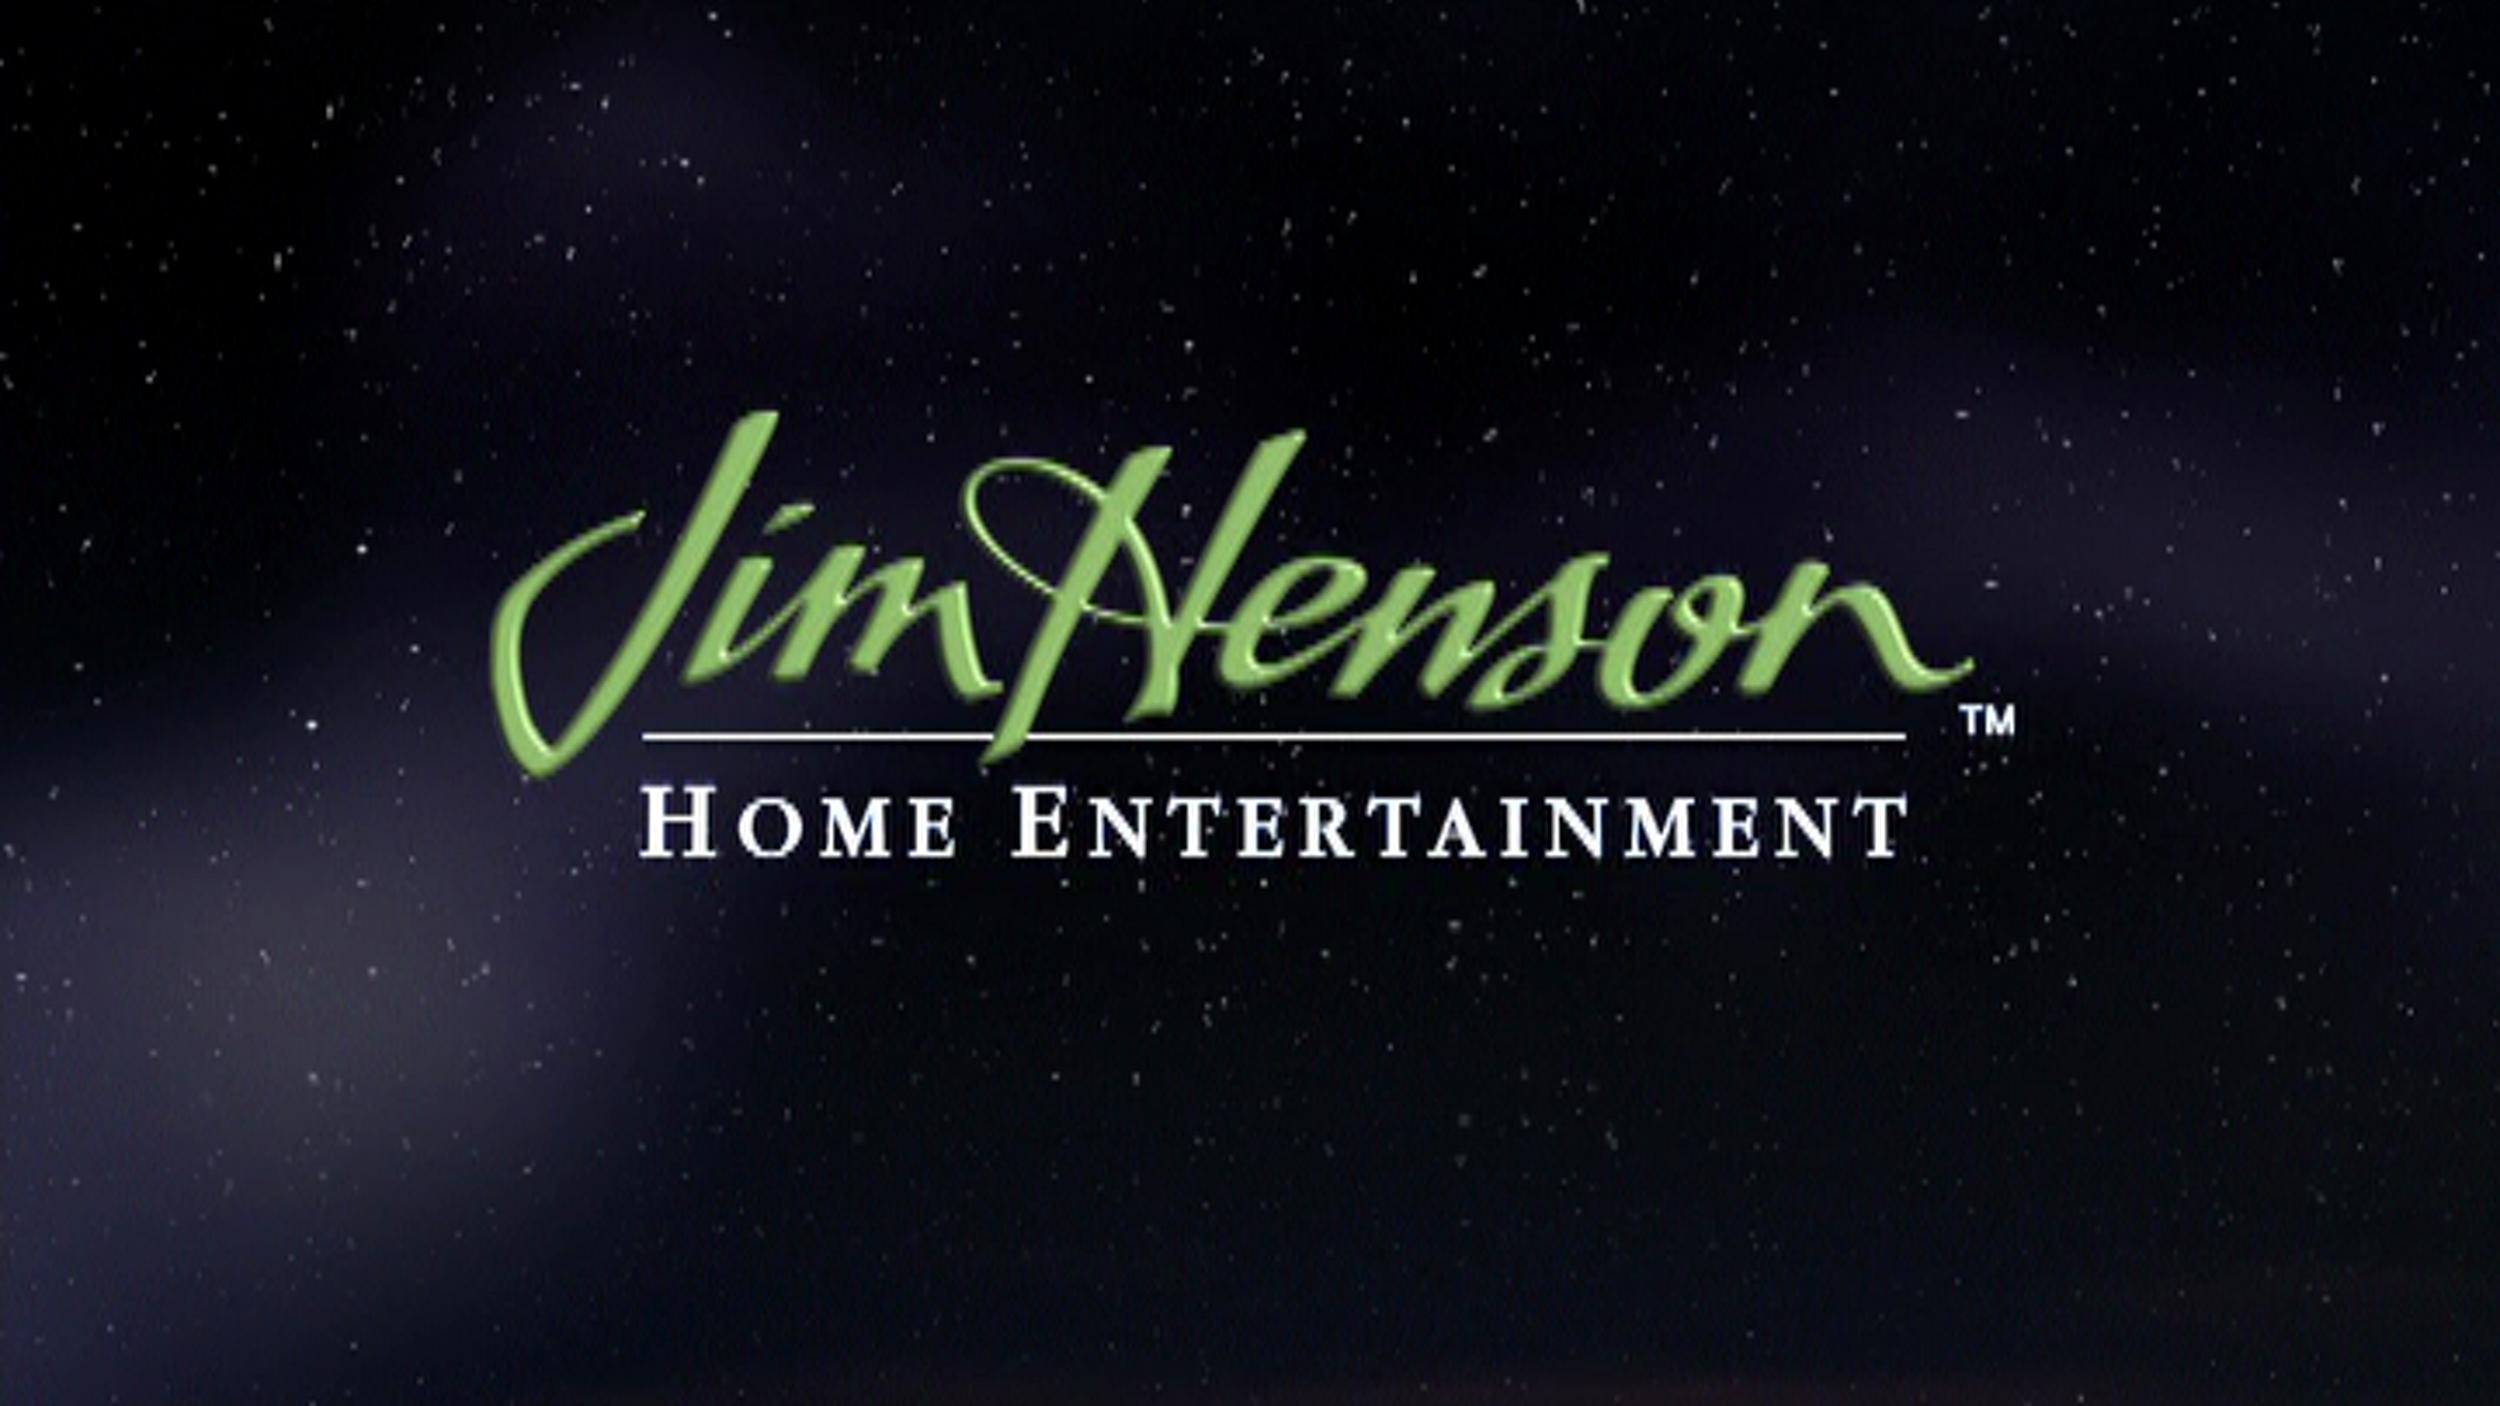 Jim henson productions Logos